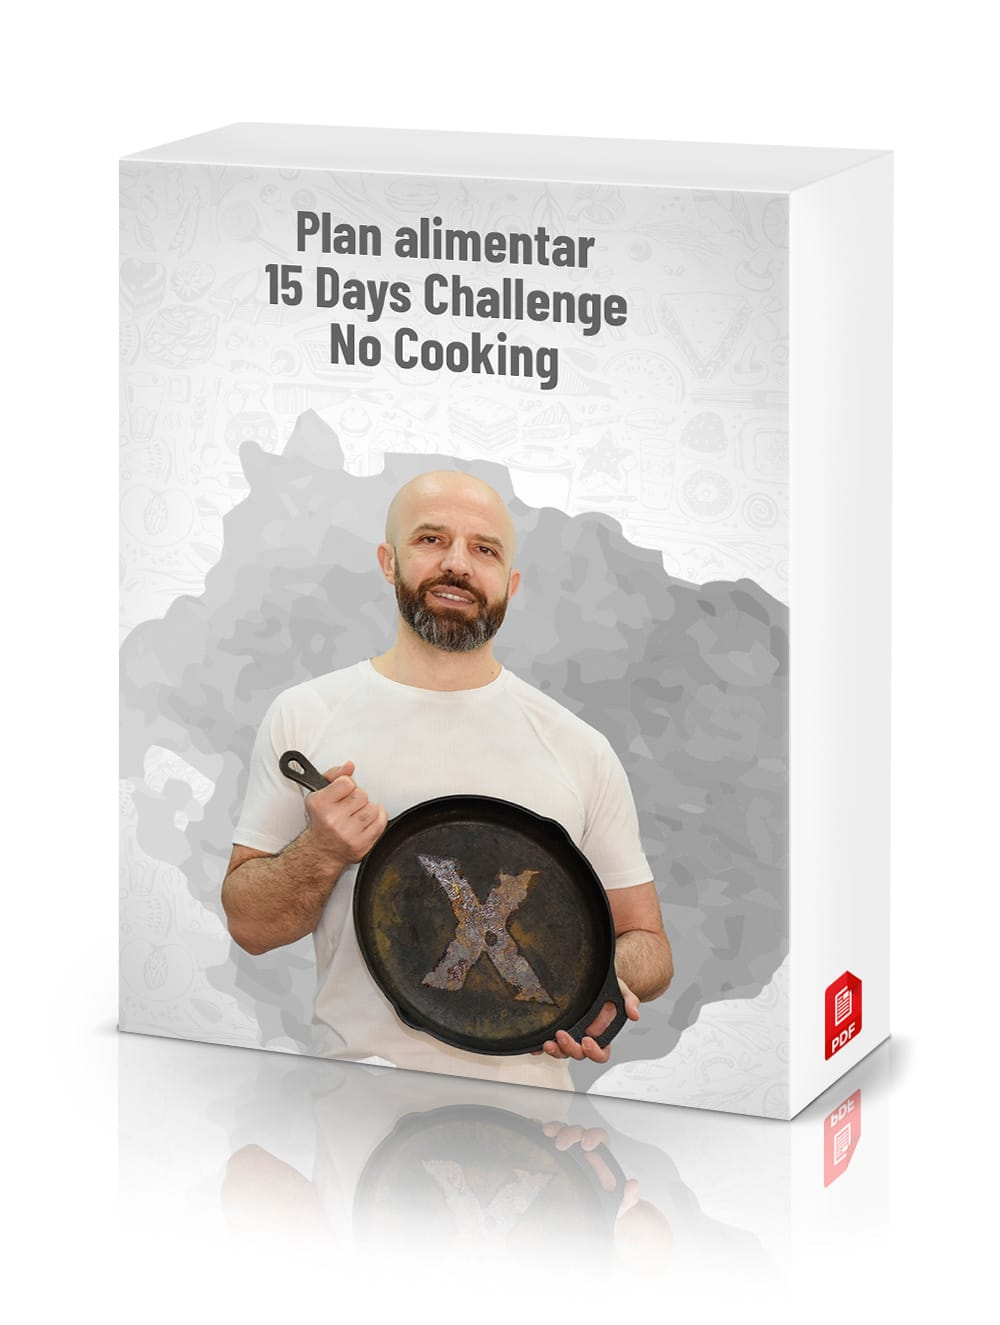 Plan alimentar 15 Days Challenge (NO COOKING)